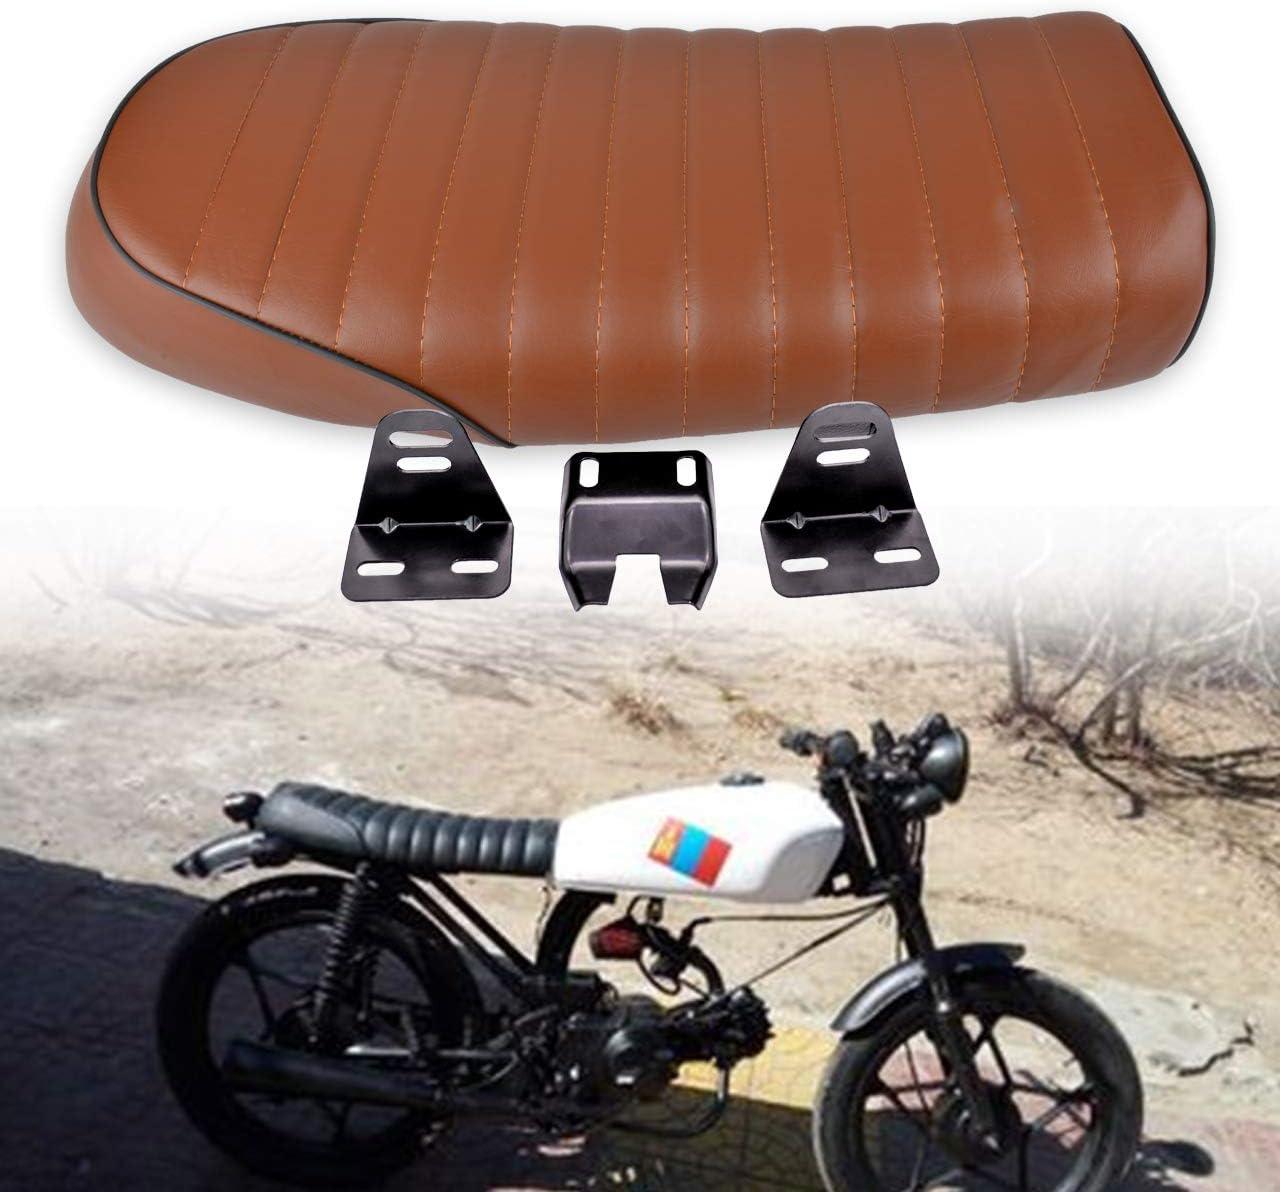 Modification Saddle Seat Universal Elerose Universal Leather Motorcycle Racing Seat